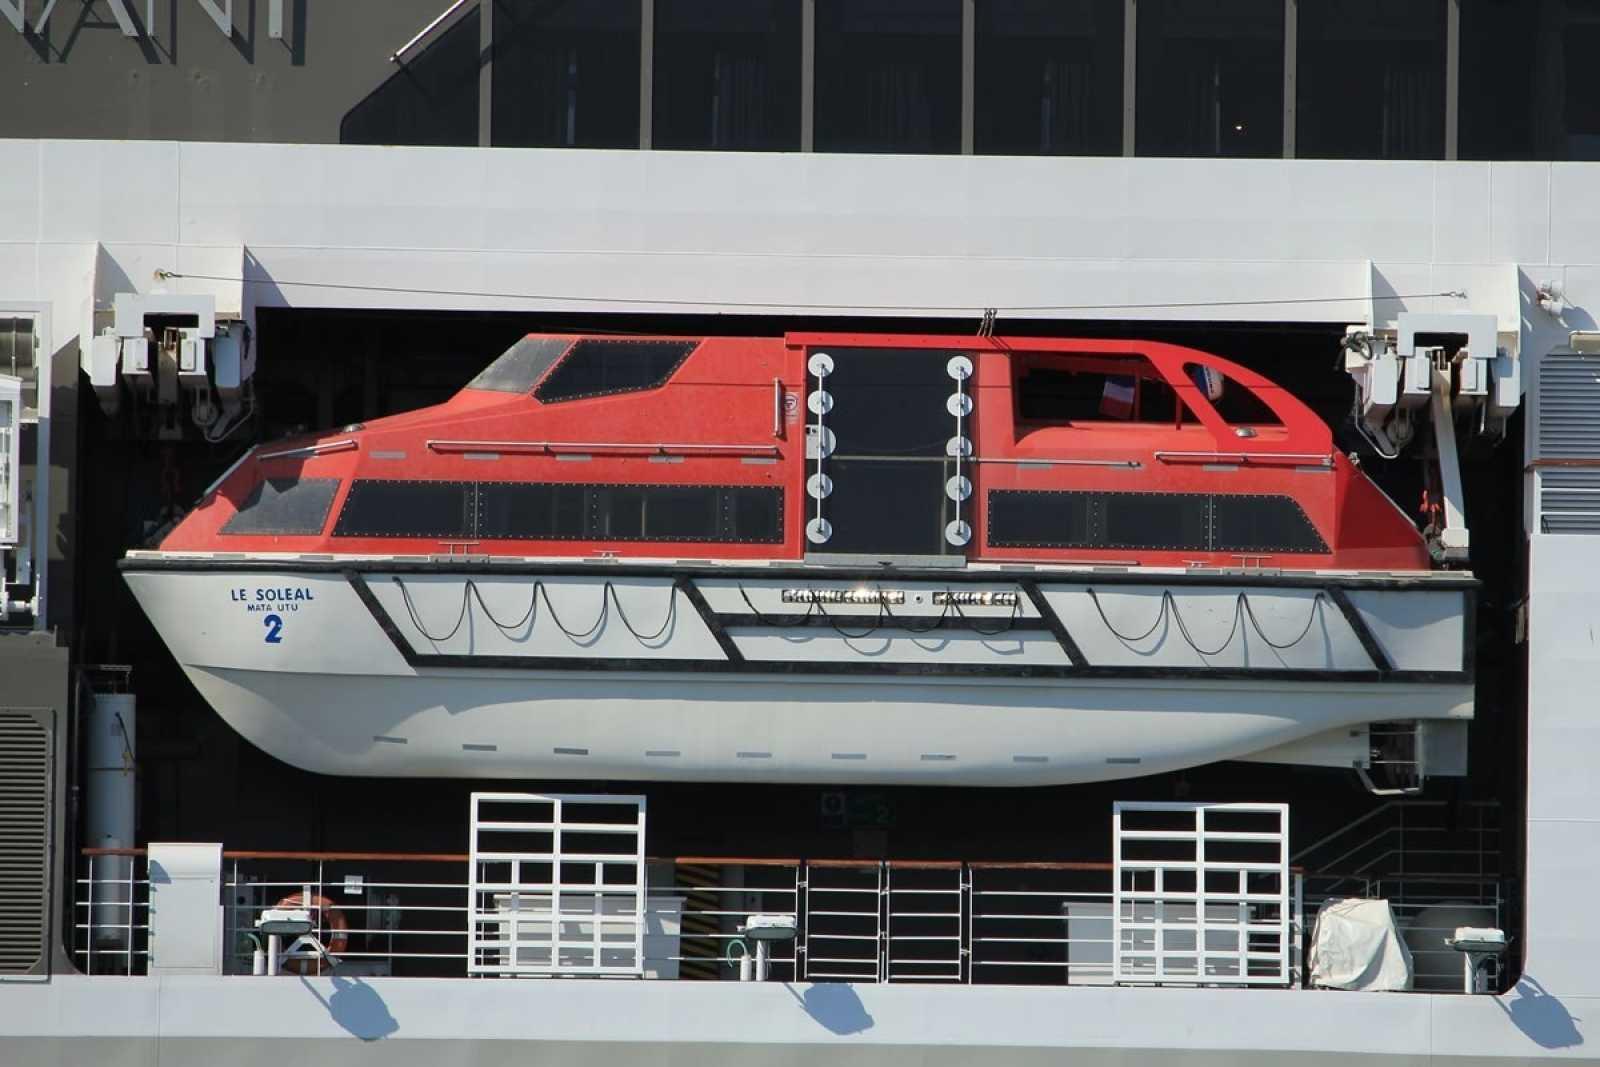 Lifeboat 190319 110659 75nayp73g